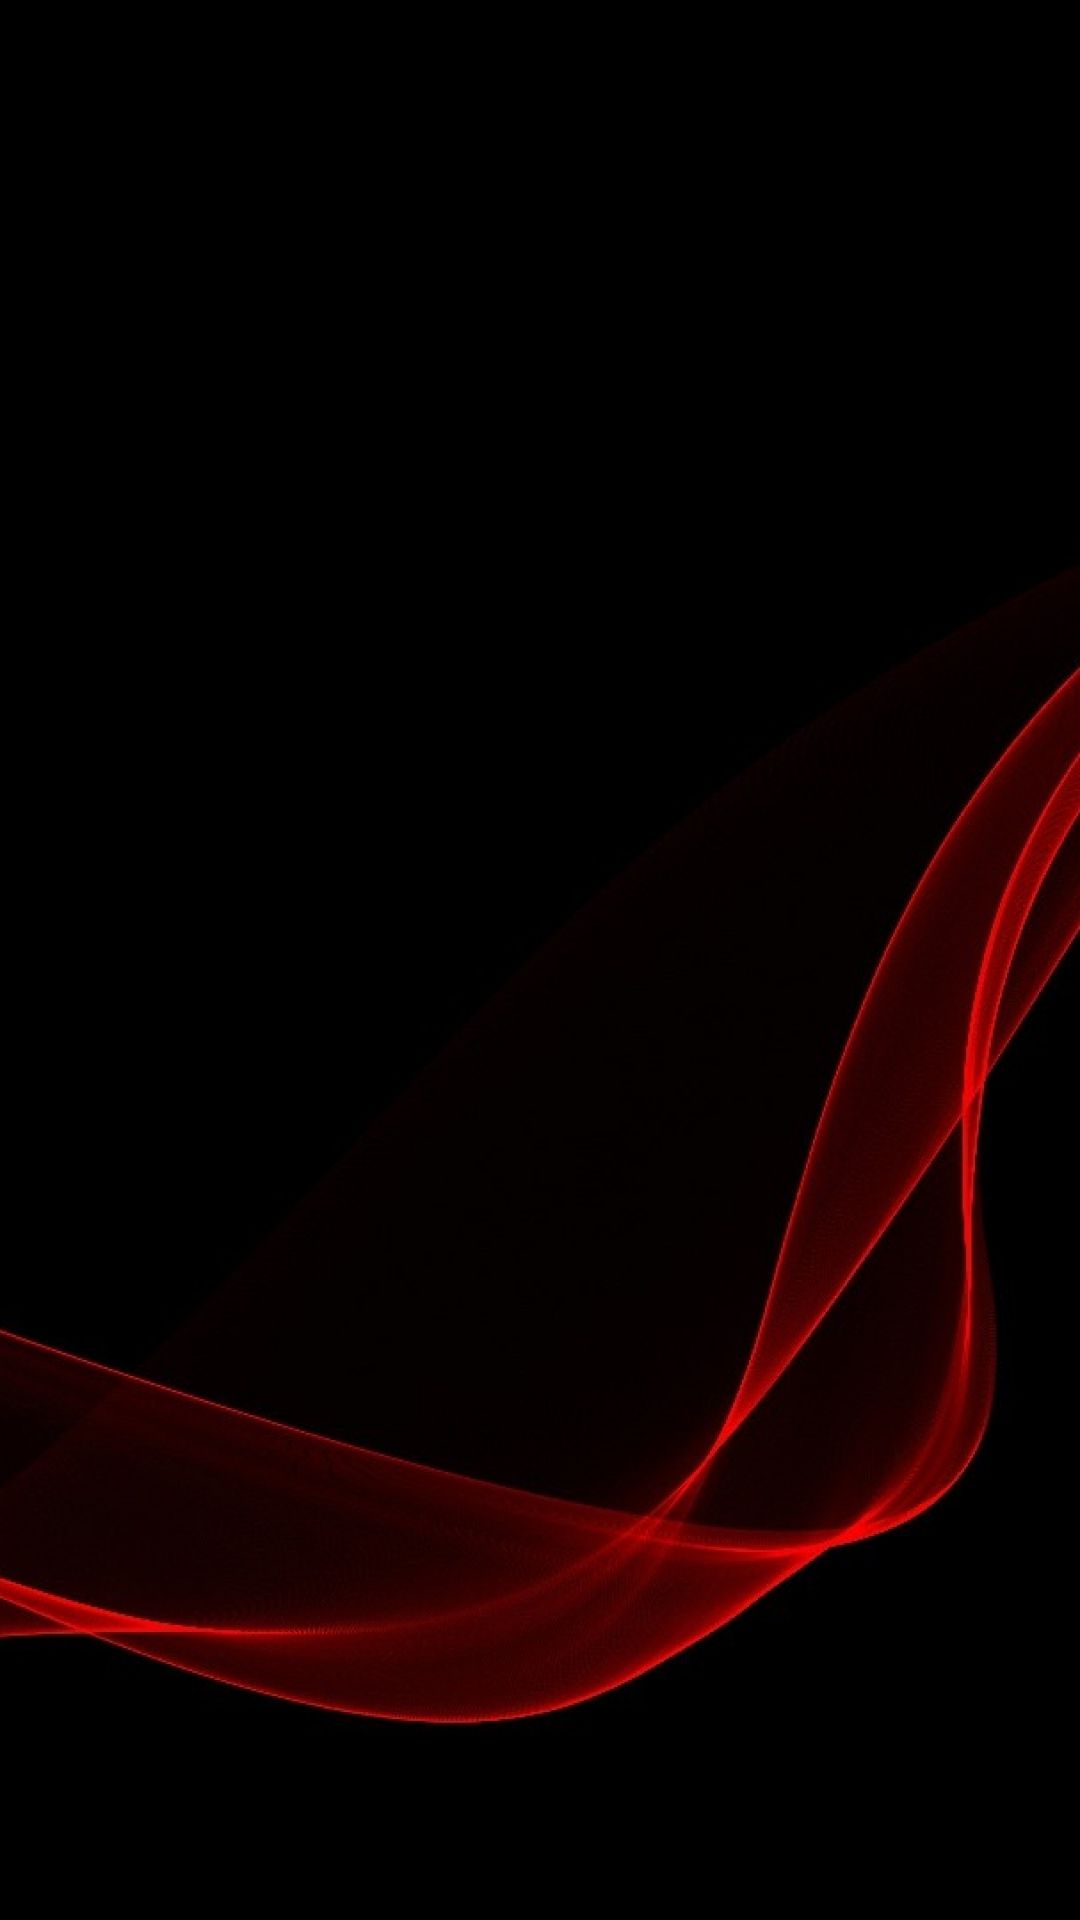 Pin By Amir Rezazadeh On Curls Swirls Collection Music Wallpaper Abstract Iphone Wallpaper Black Hd Wallpaper